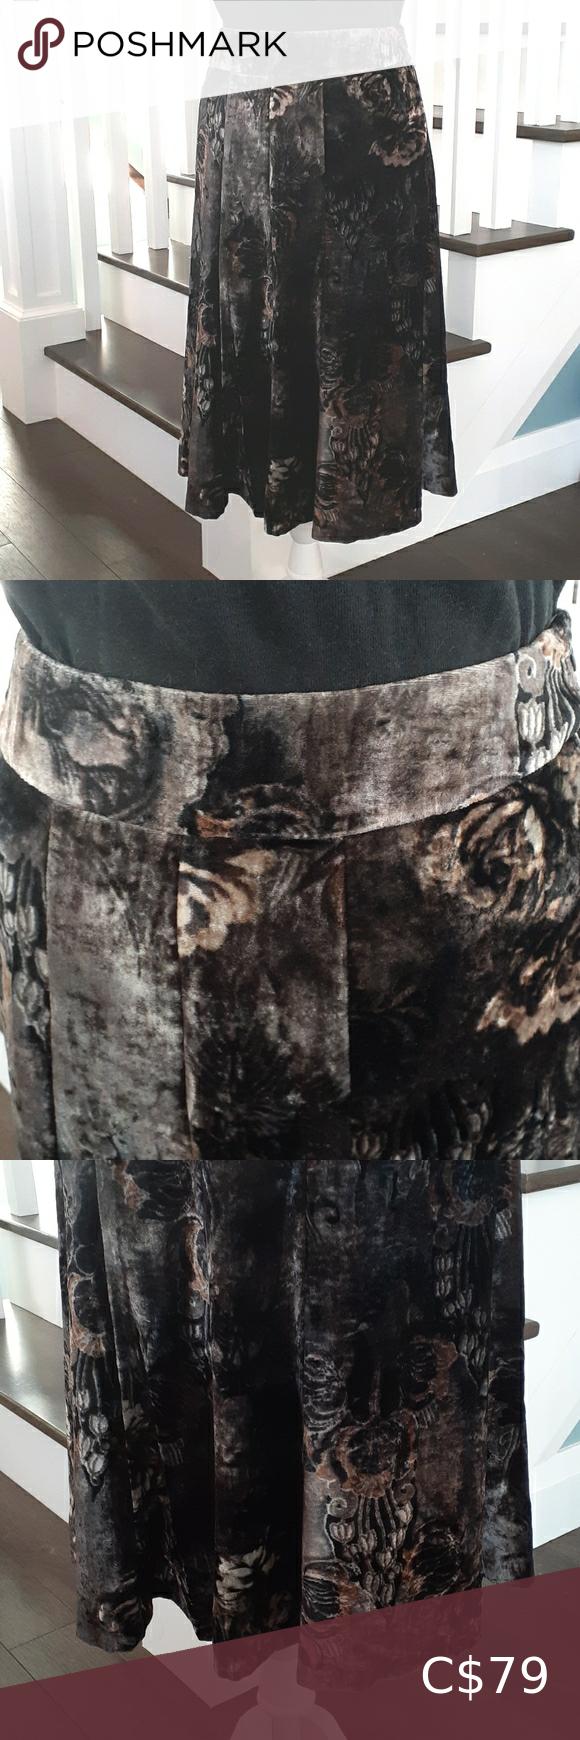 Tristan black velvet skirt with floral pattern